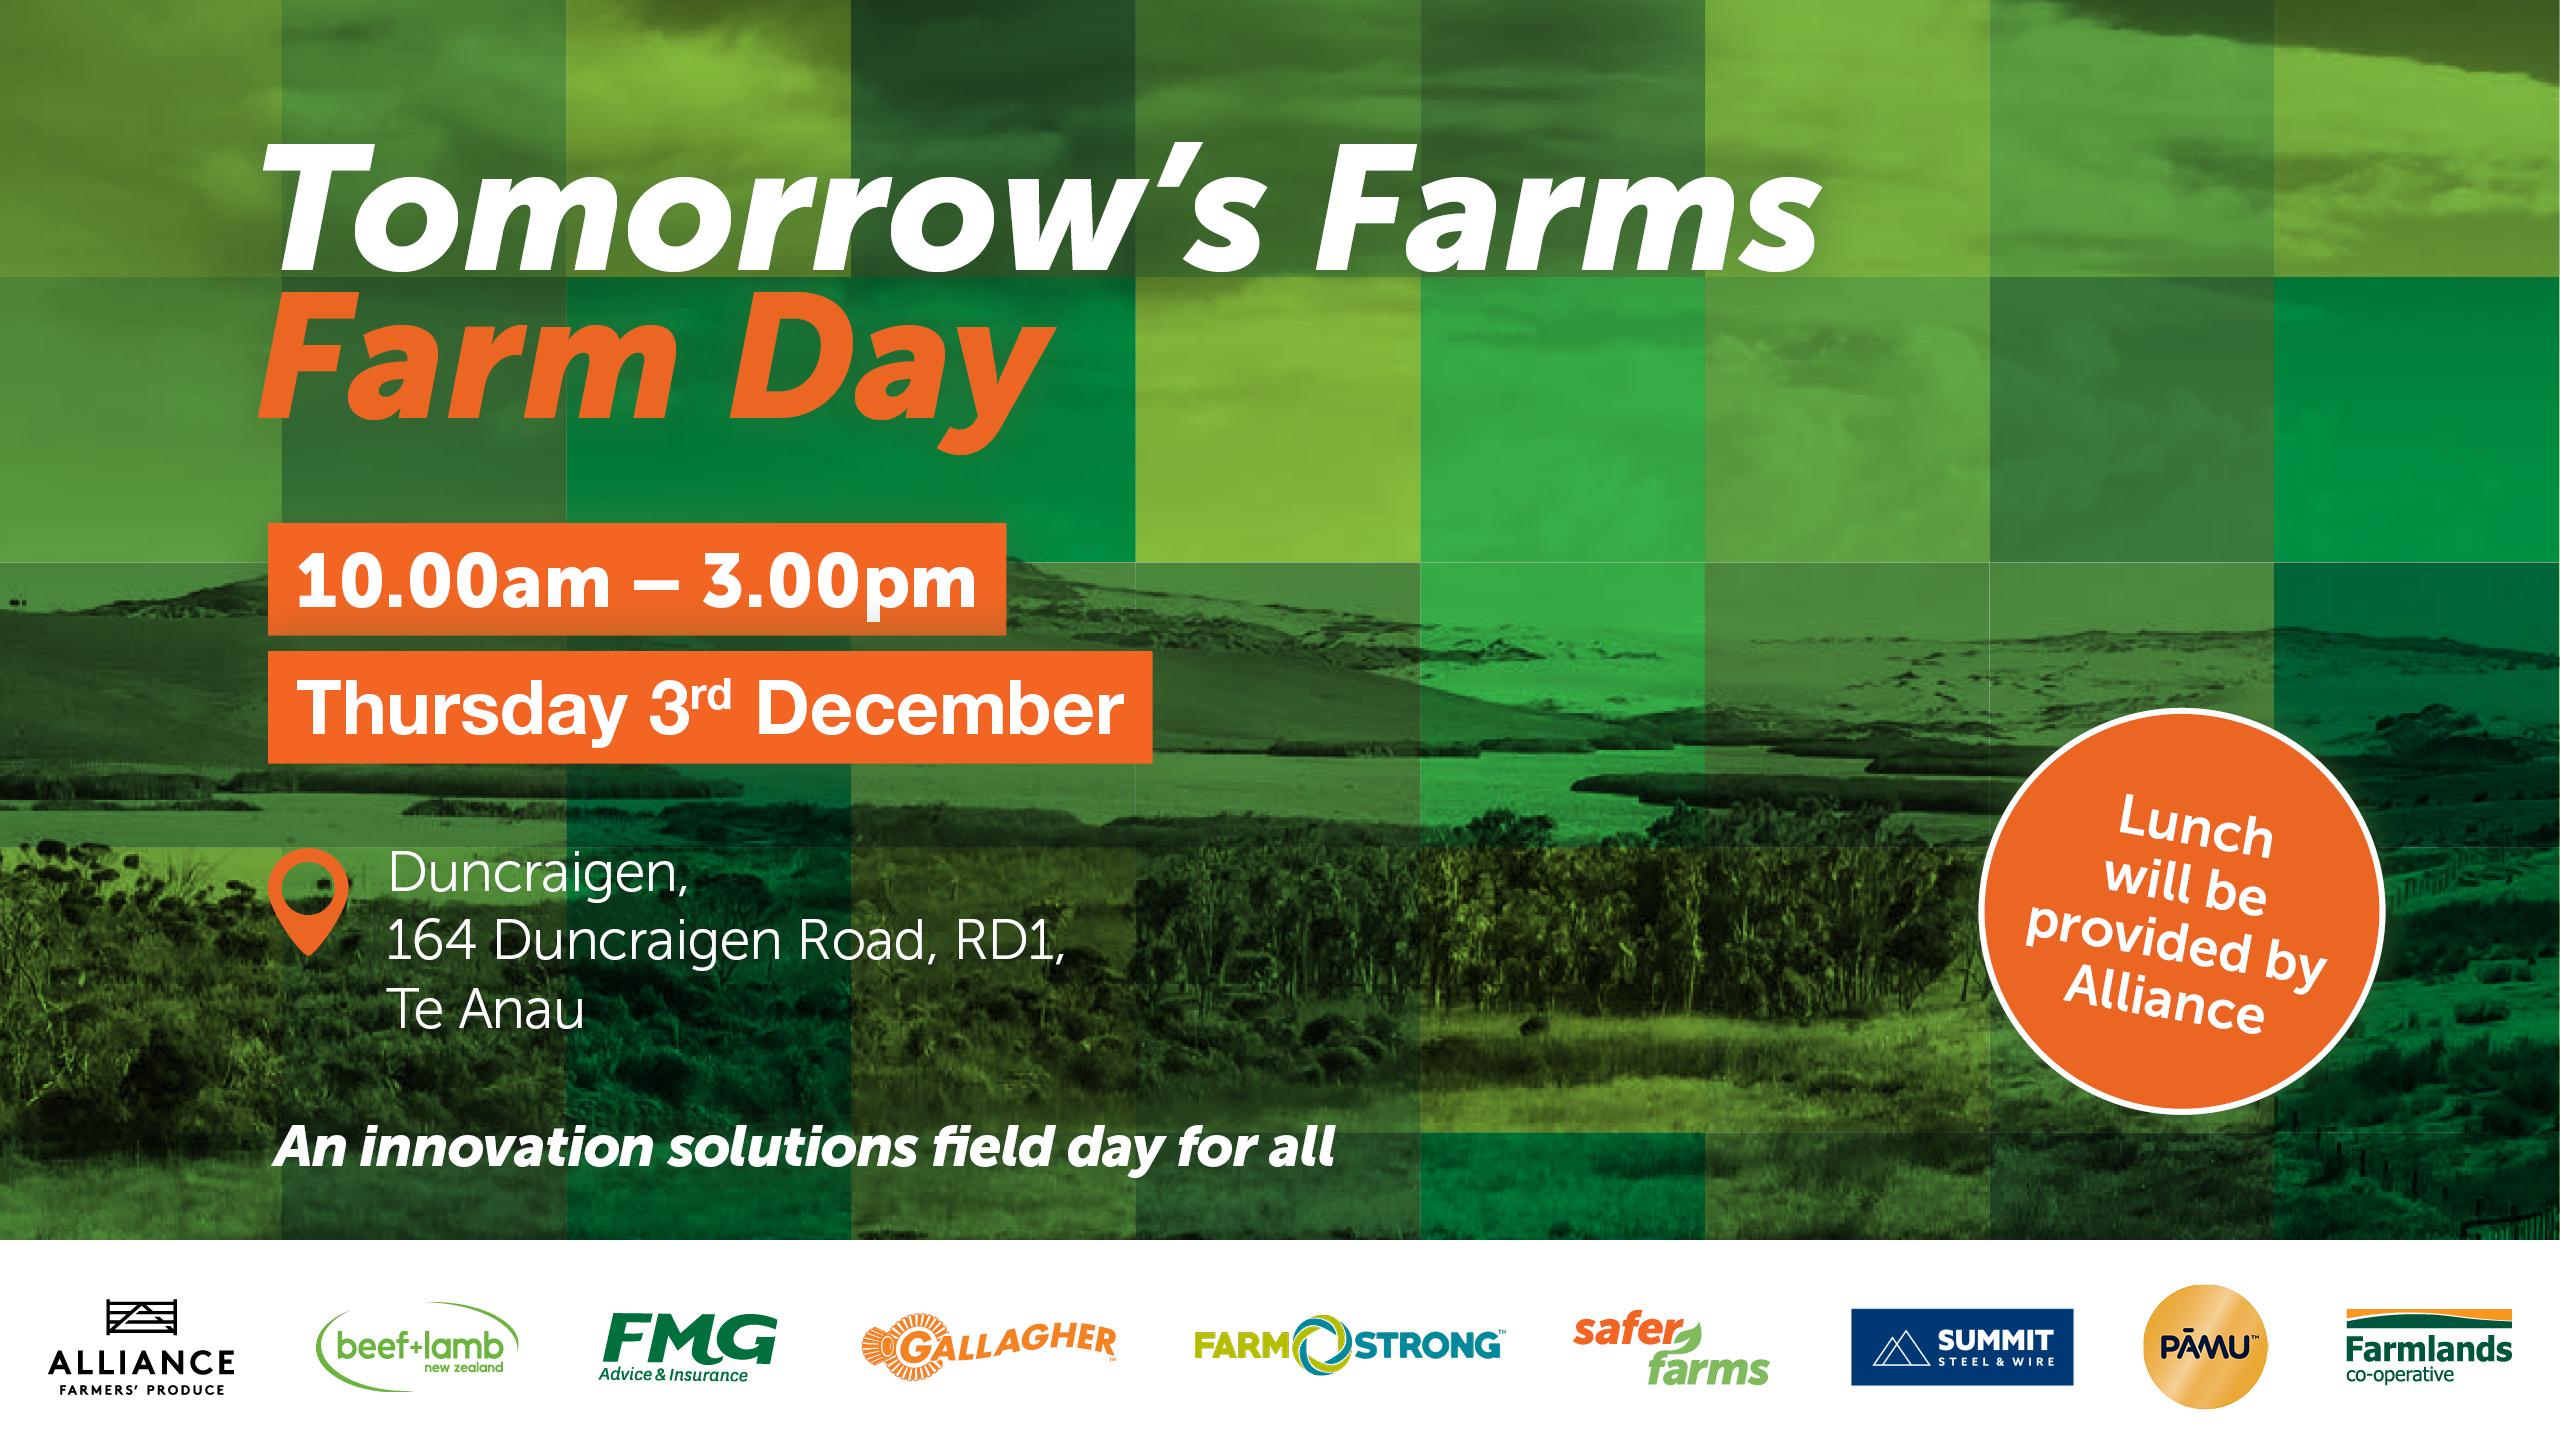 Open Day invites locals to Pamu's Duncraigen Farm in Te Anau